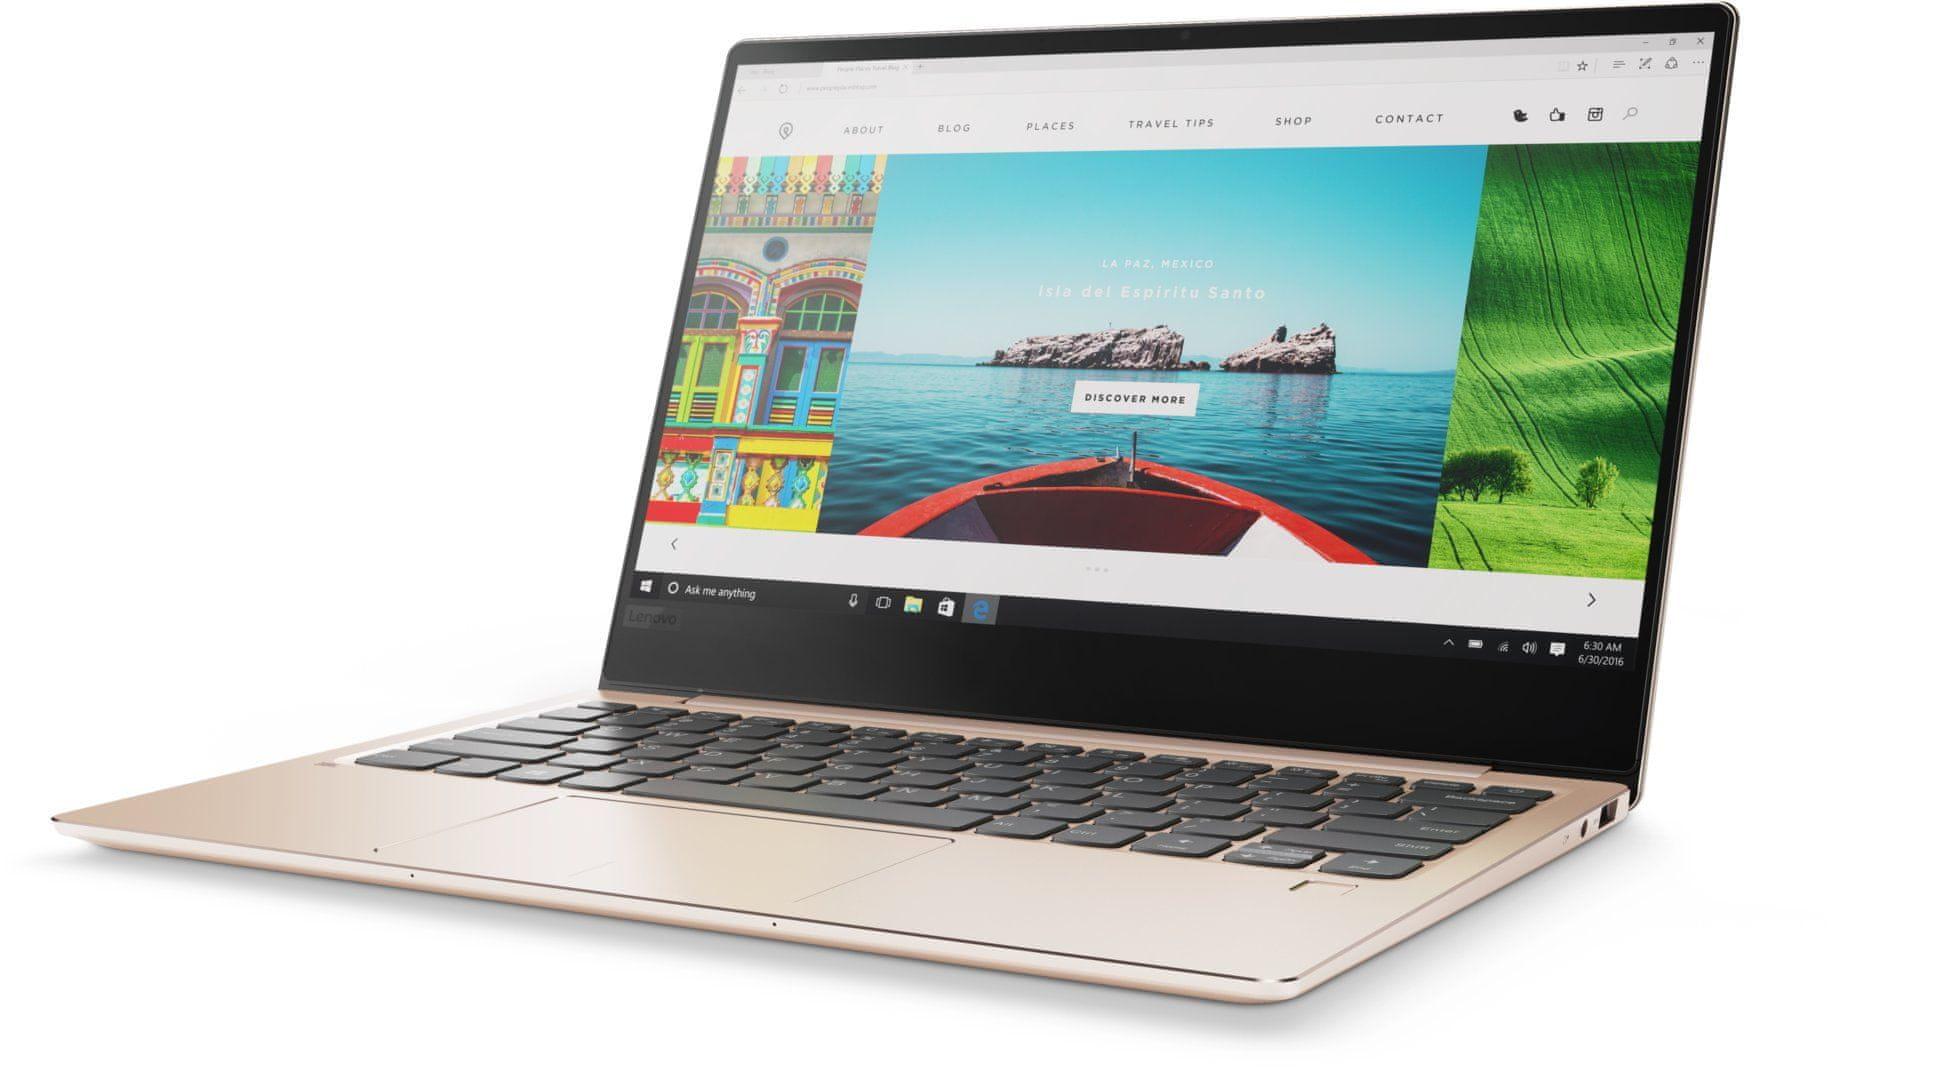 Notebook IdeaPad 720s